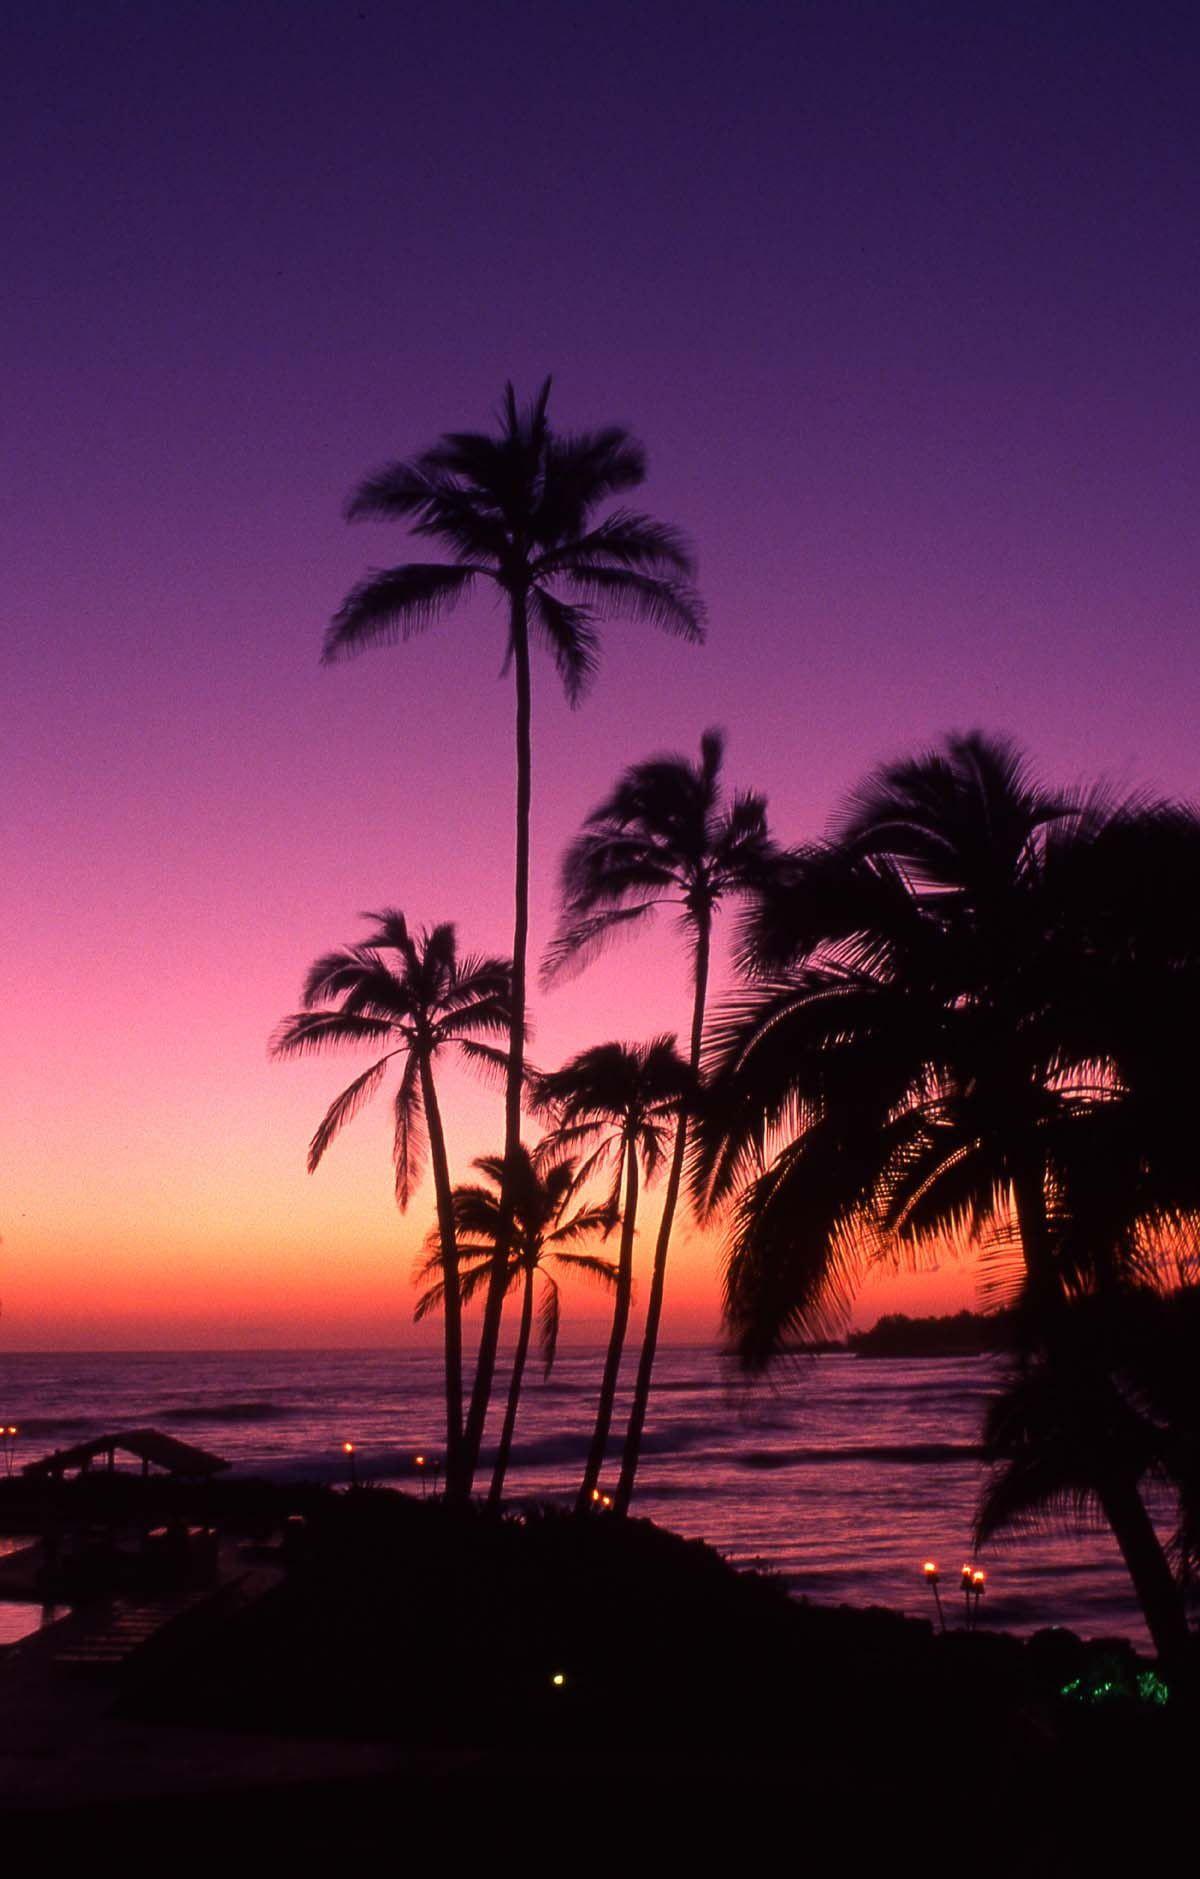 more purple sunsets by sharpieDei1 on DeviantArt